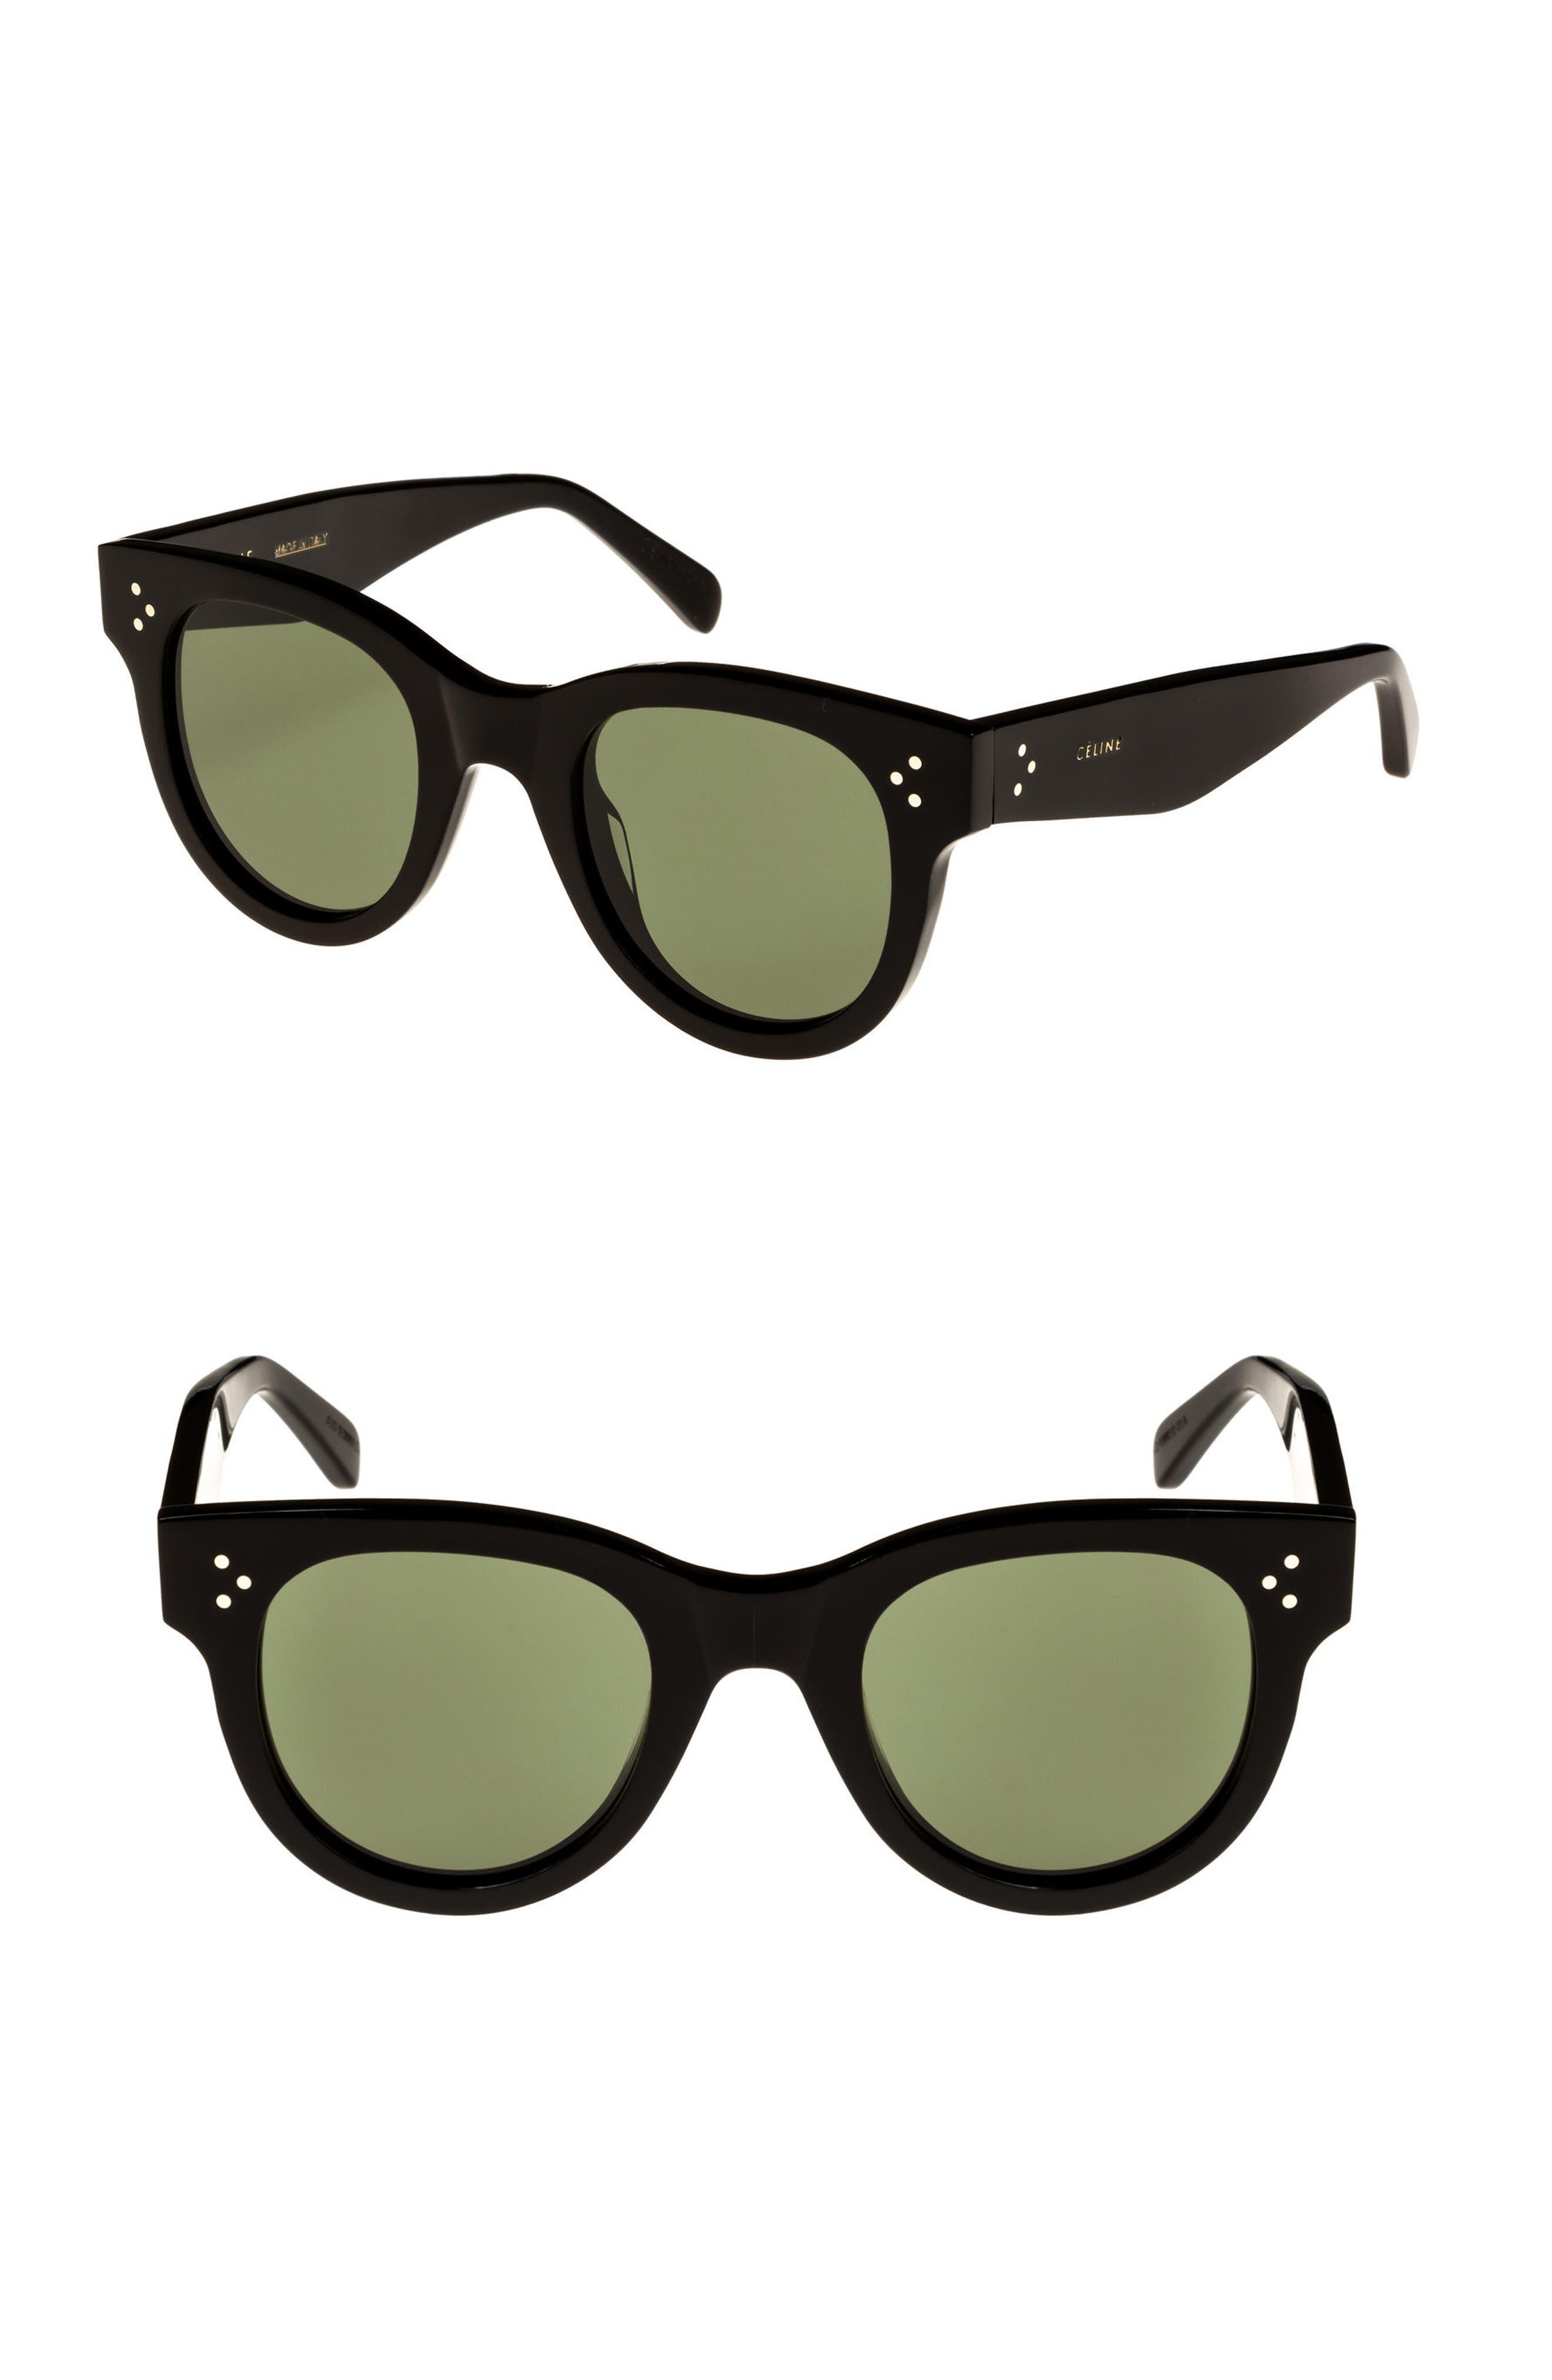 48mm Cat Eye Sunglasses,                             Main thumbnail 1, color,                             Black/ Smoke Barberini